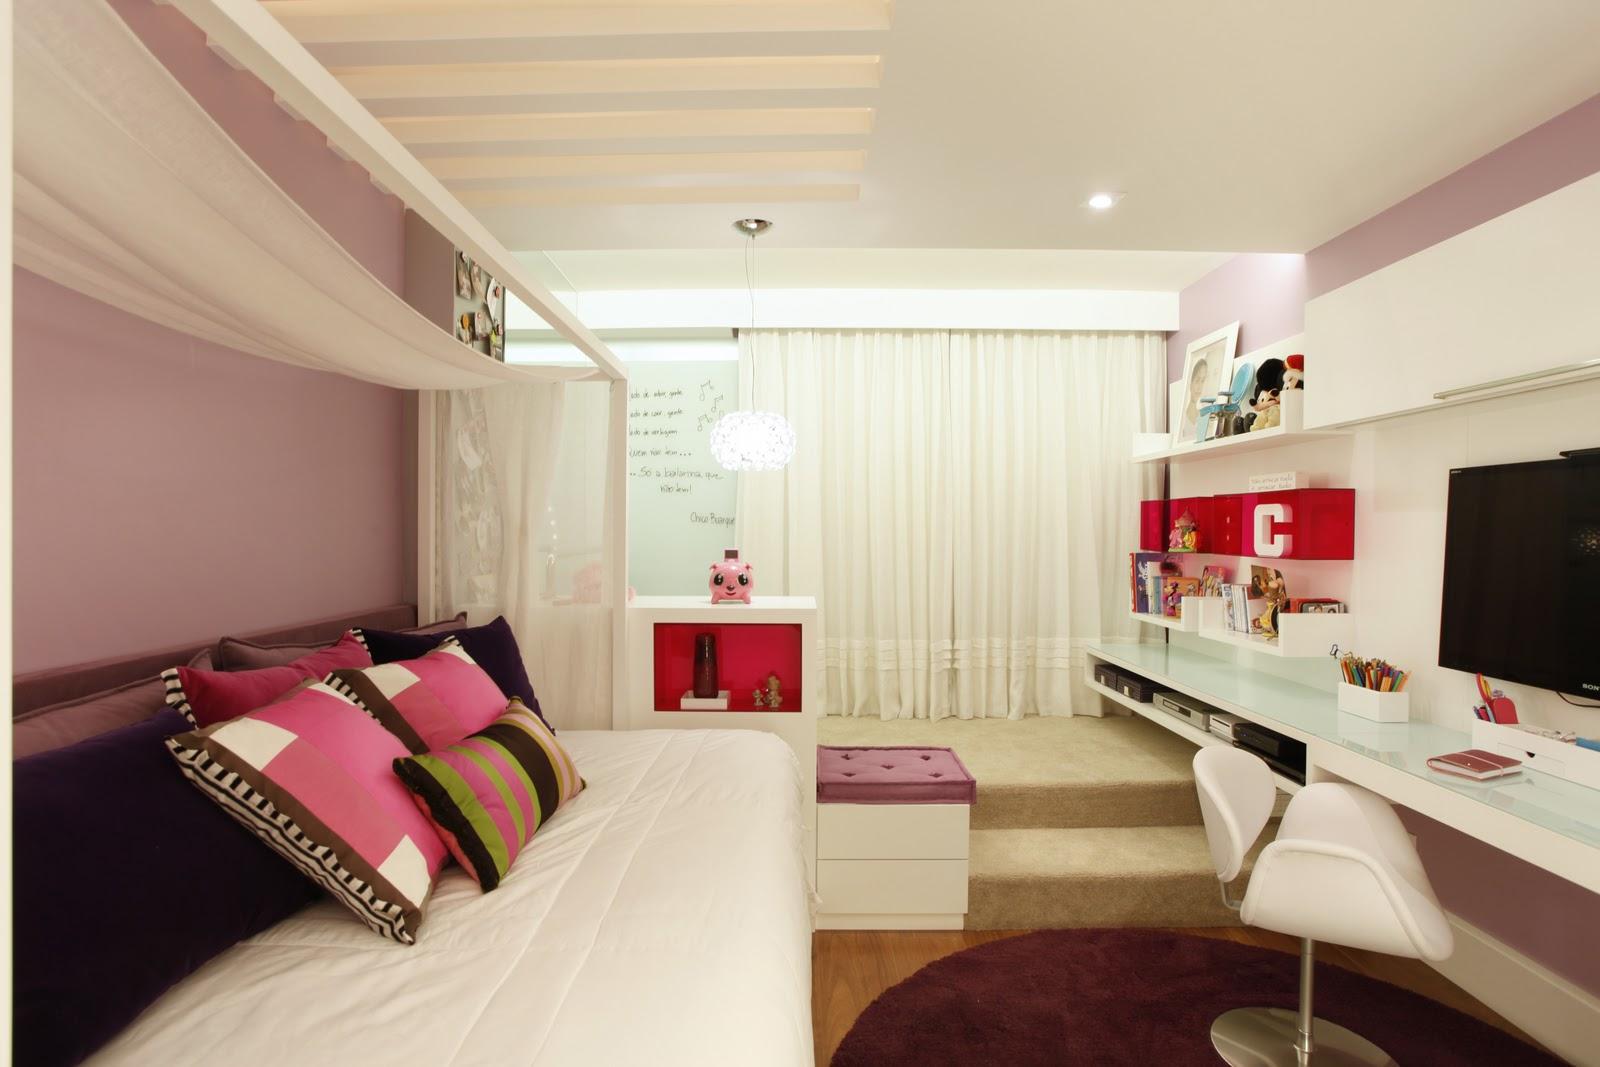 Marcela Sert u00e3 e Juliana Giusti Design de Interiores SU u00cdTE MENINA~ Dormitorio Ufrj